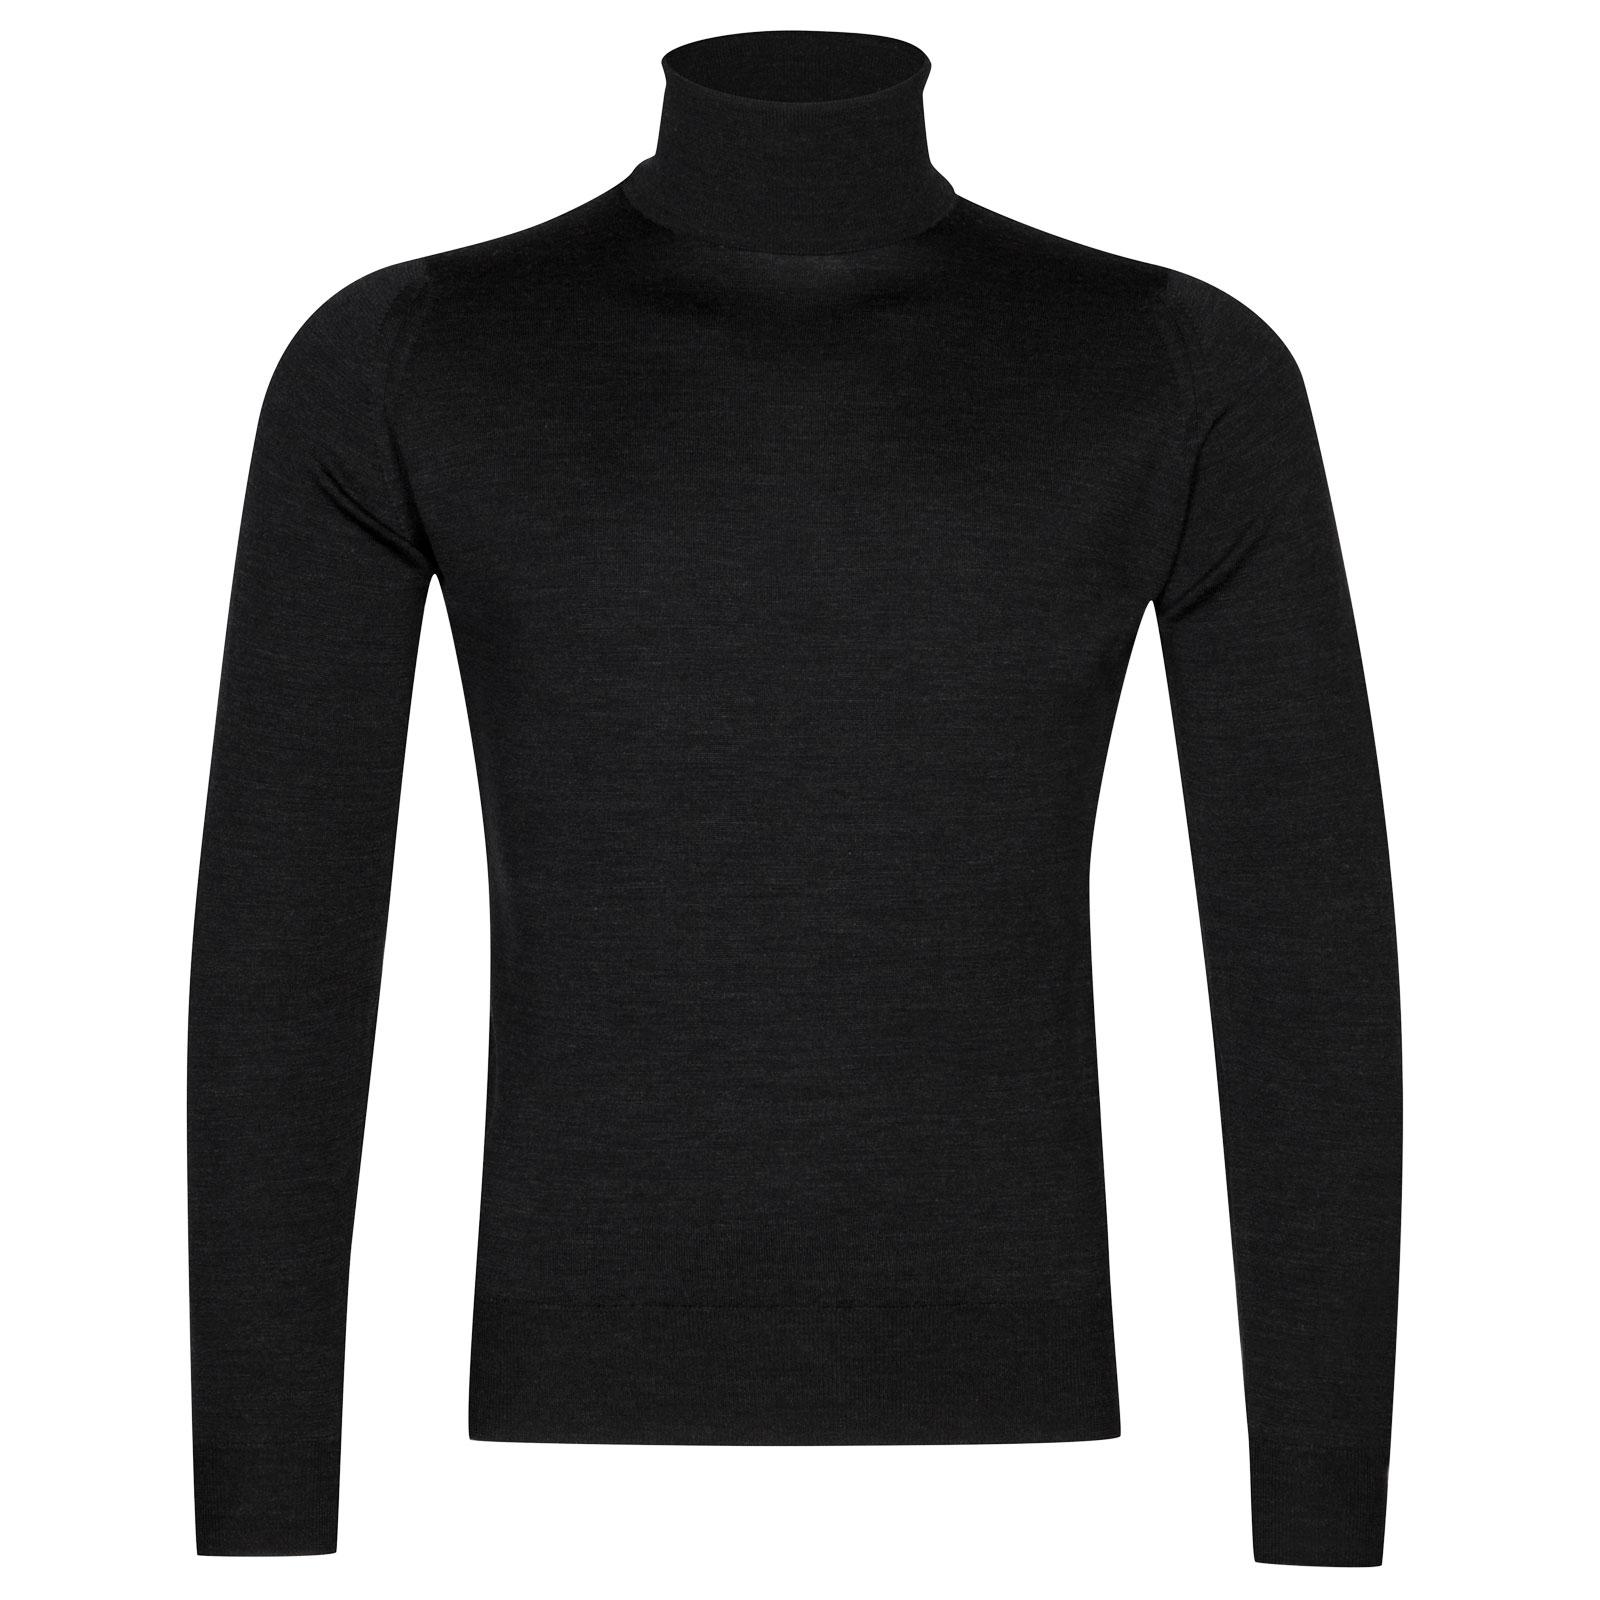 John Smedley Orta Merino Wool Pullover in Hepburn Smoke-S